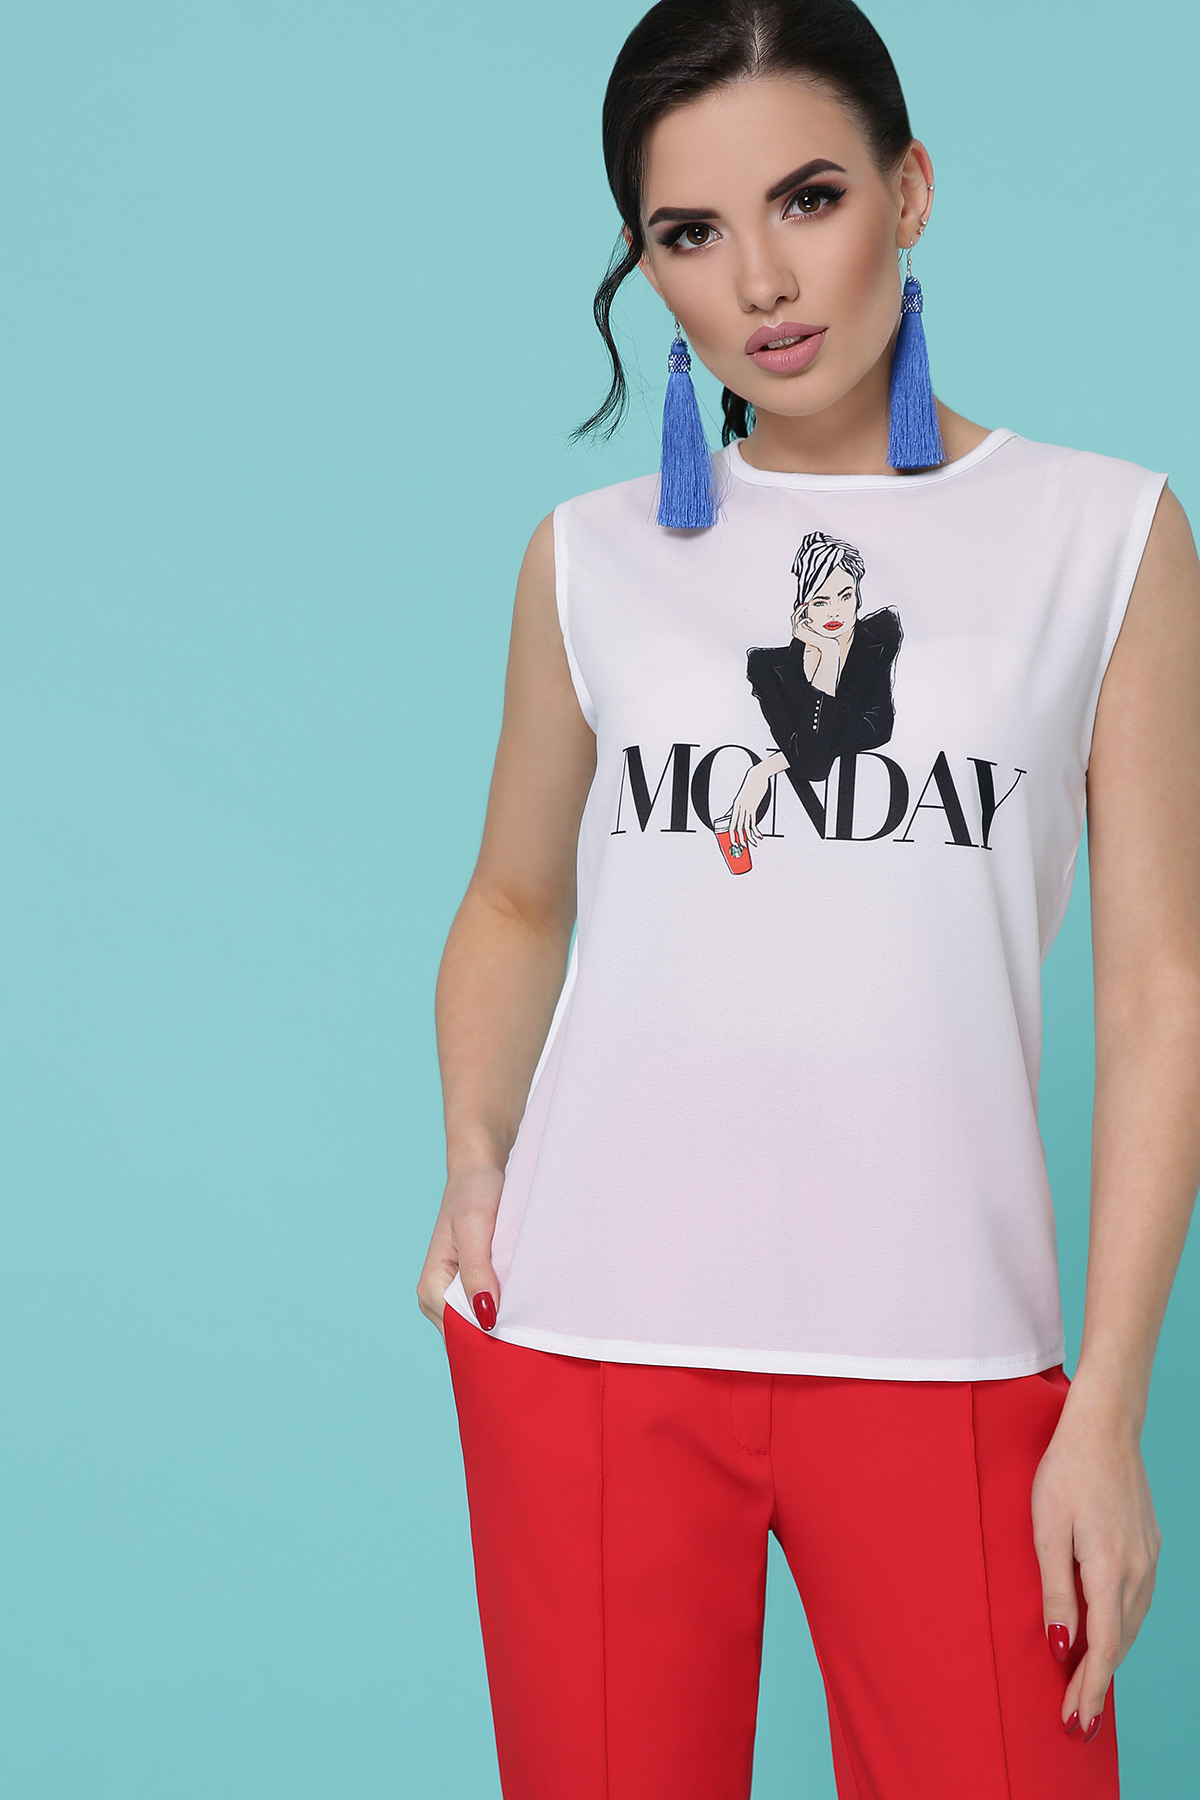 Monday футболка Киви б/р. Цвет: белый